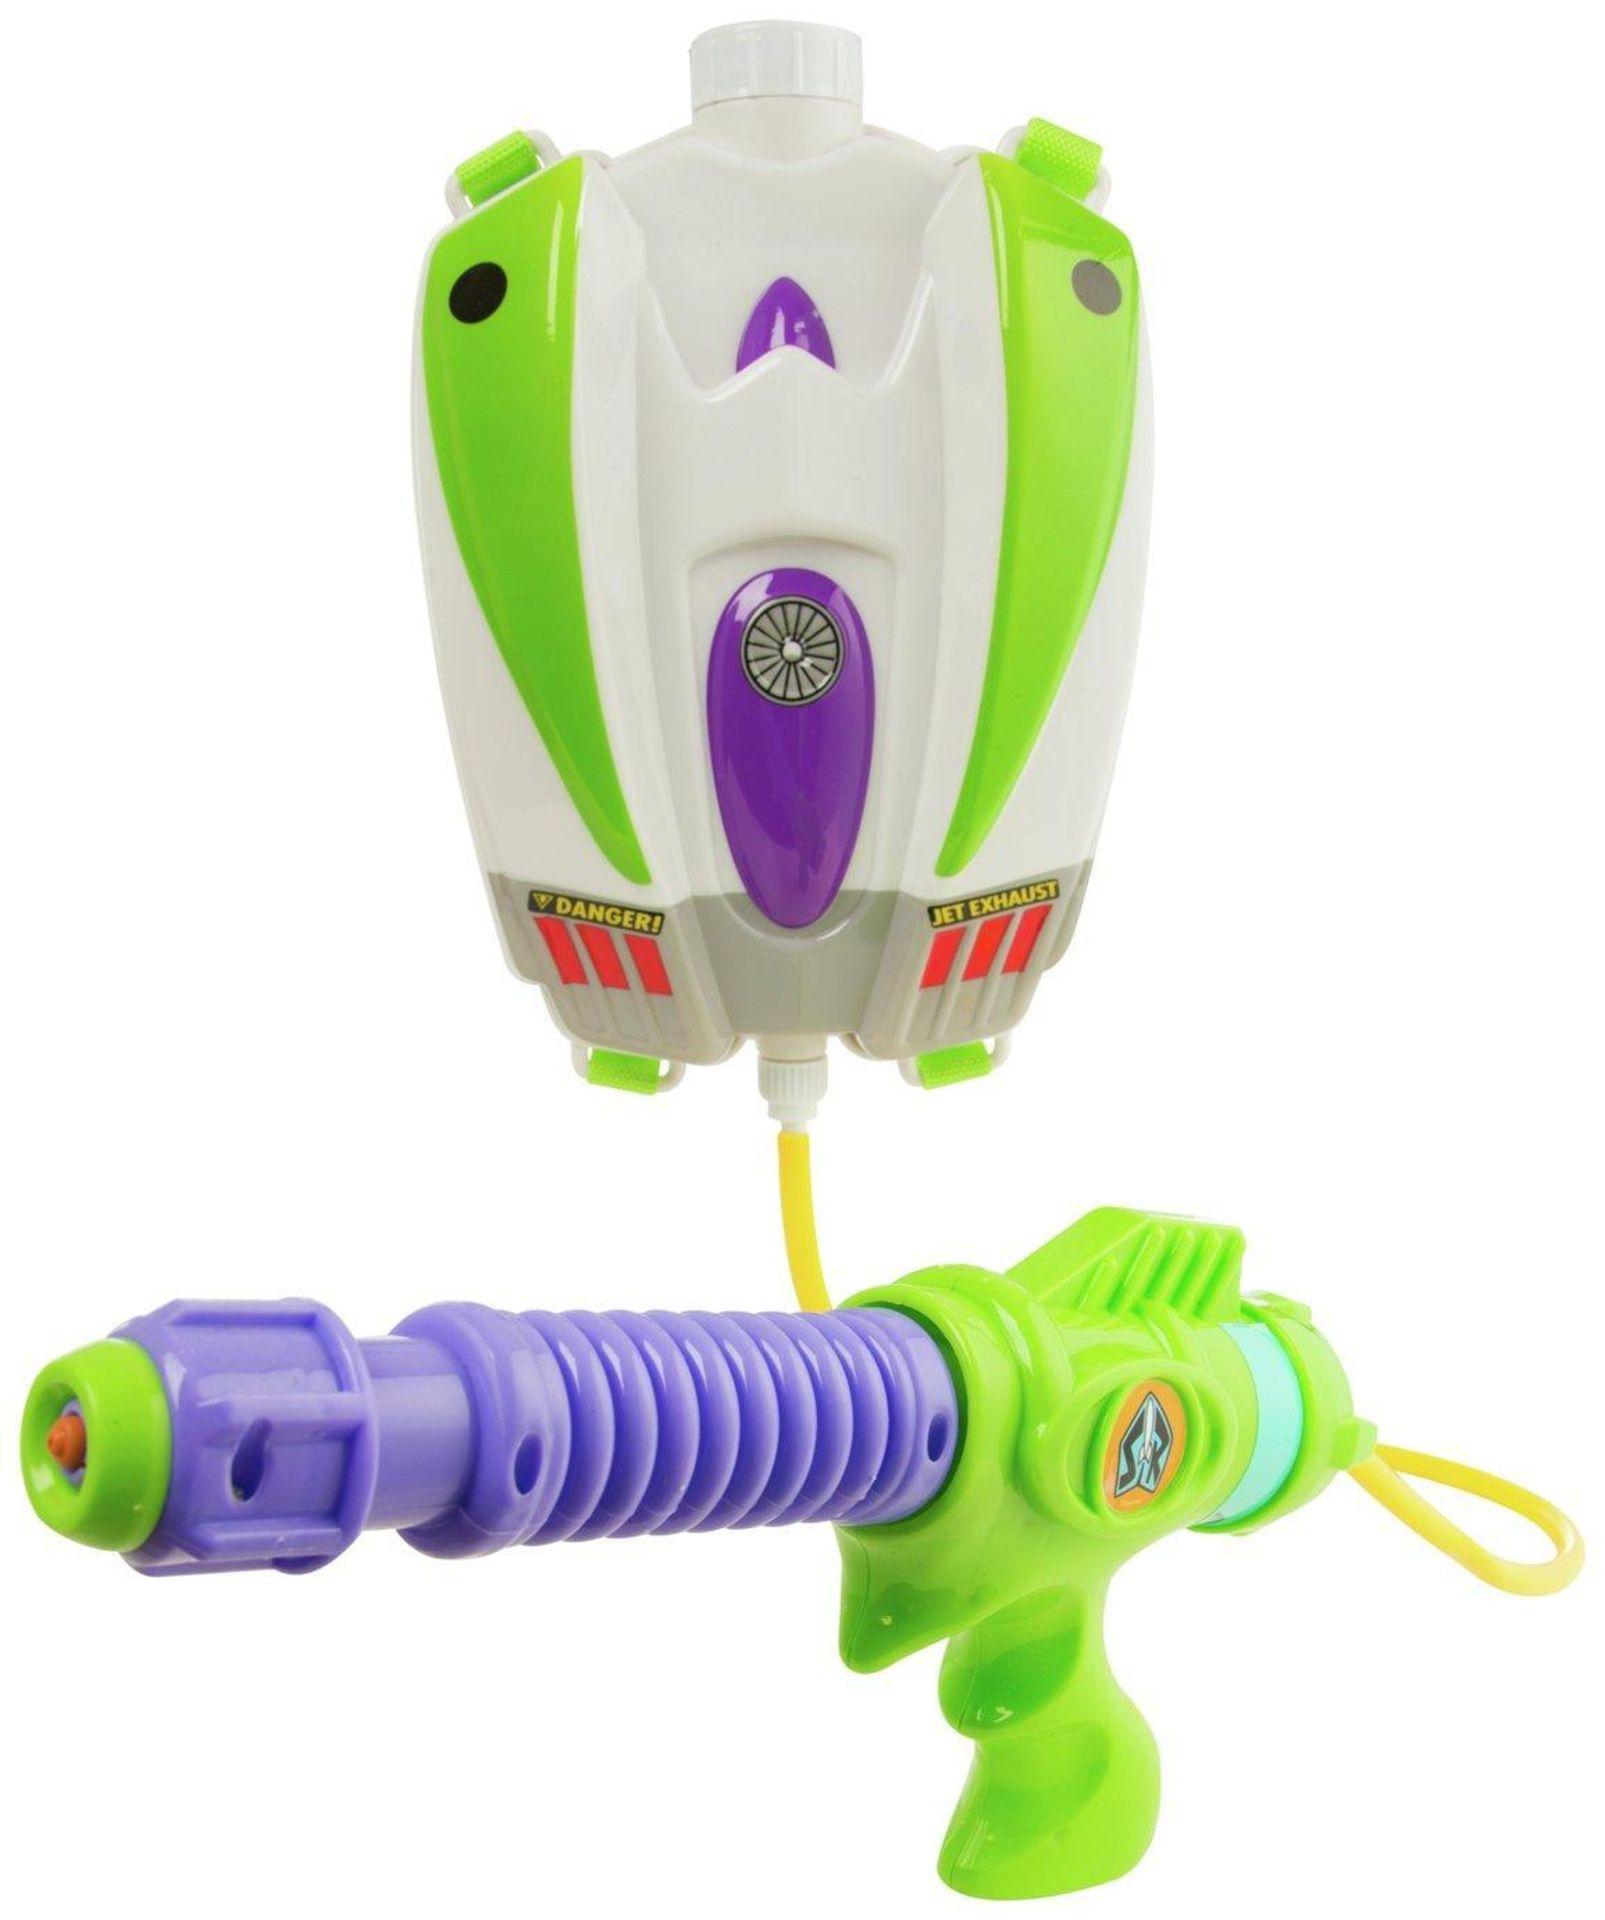 Disney Toy Story Buzz Lightyear Water Blaster Backpack, £10.00 RRP